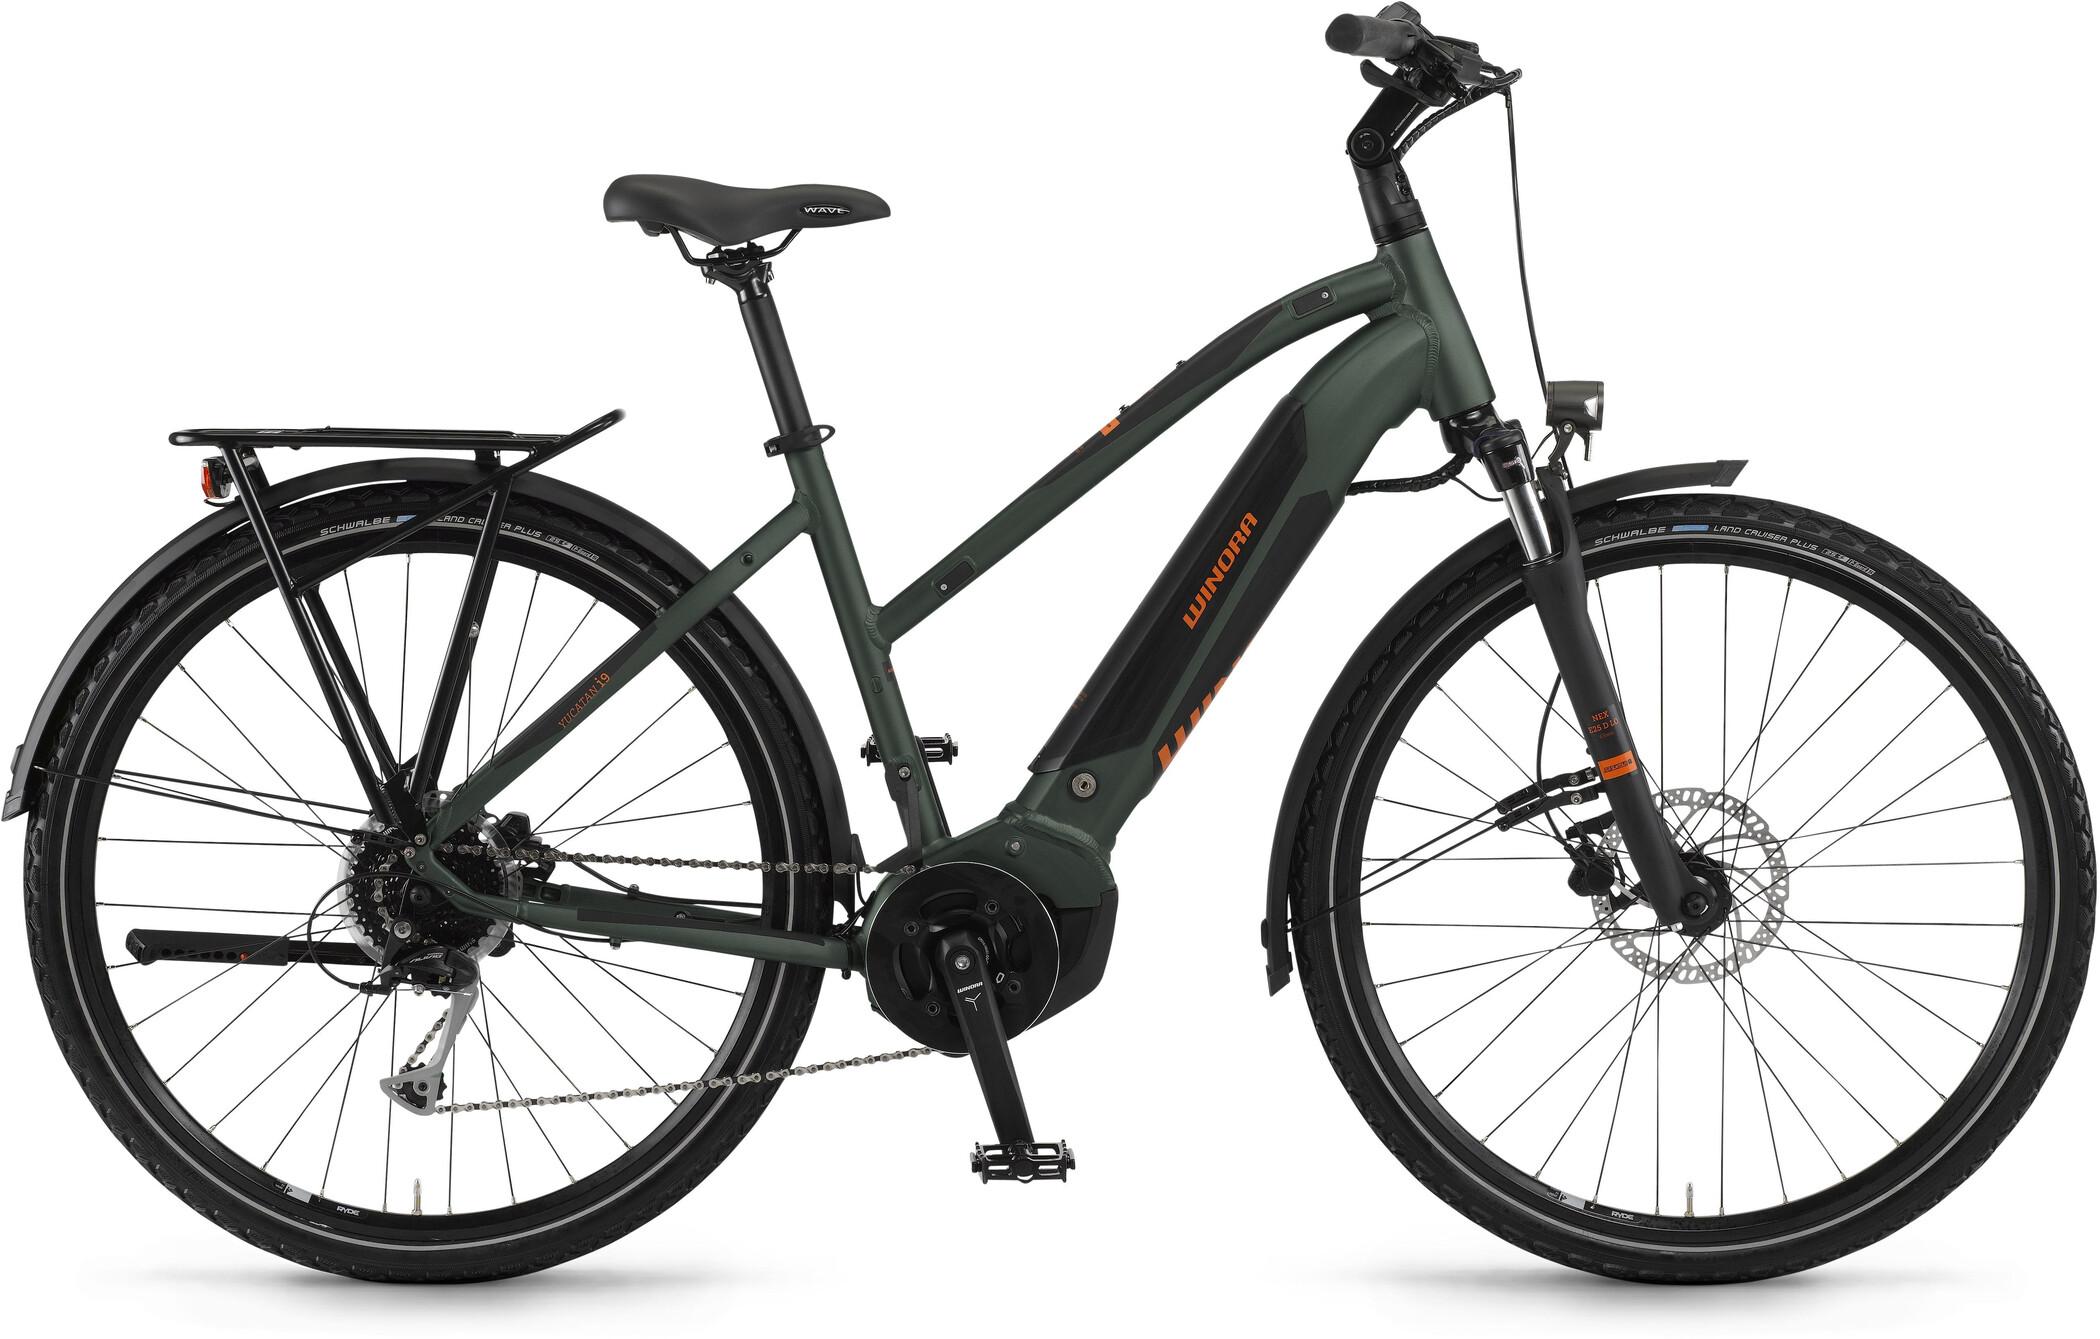 Winora Yucatan i9 Damer, olive matte (2020)   City-cykler